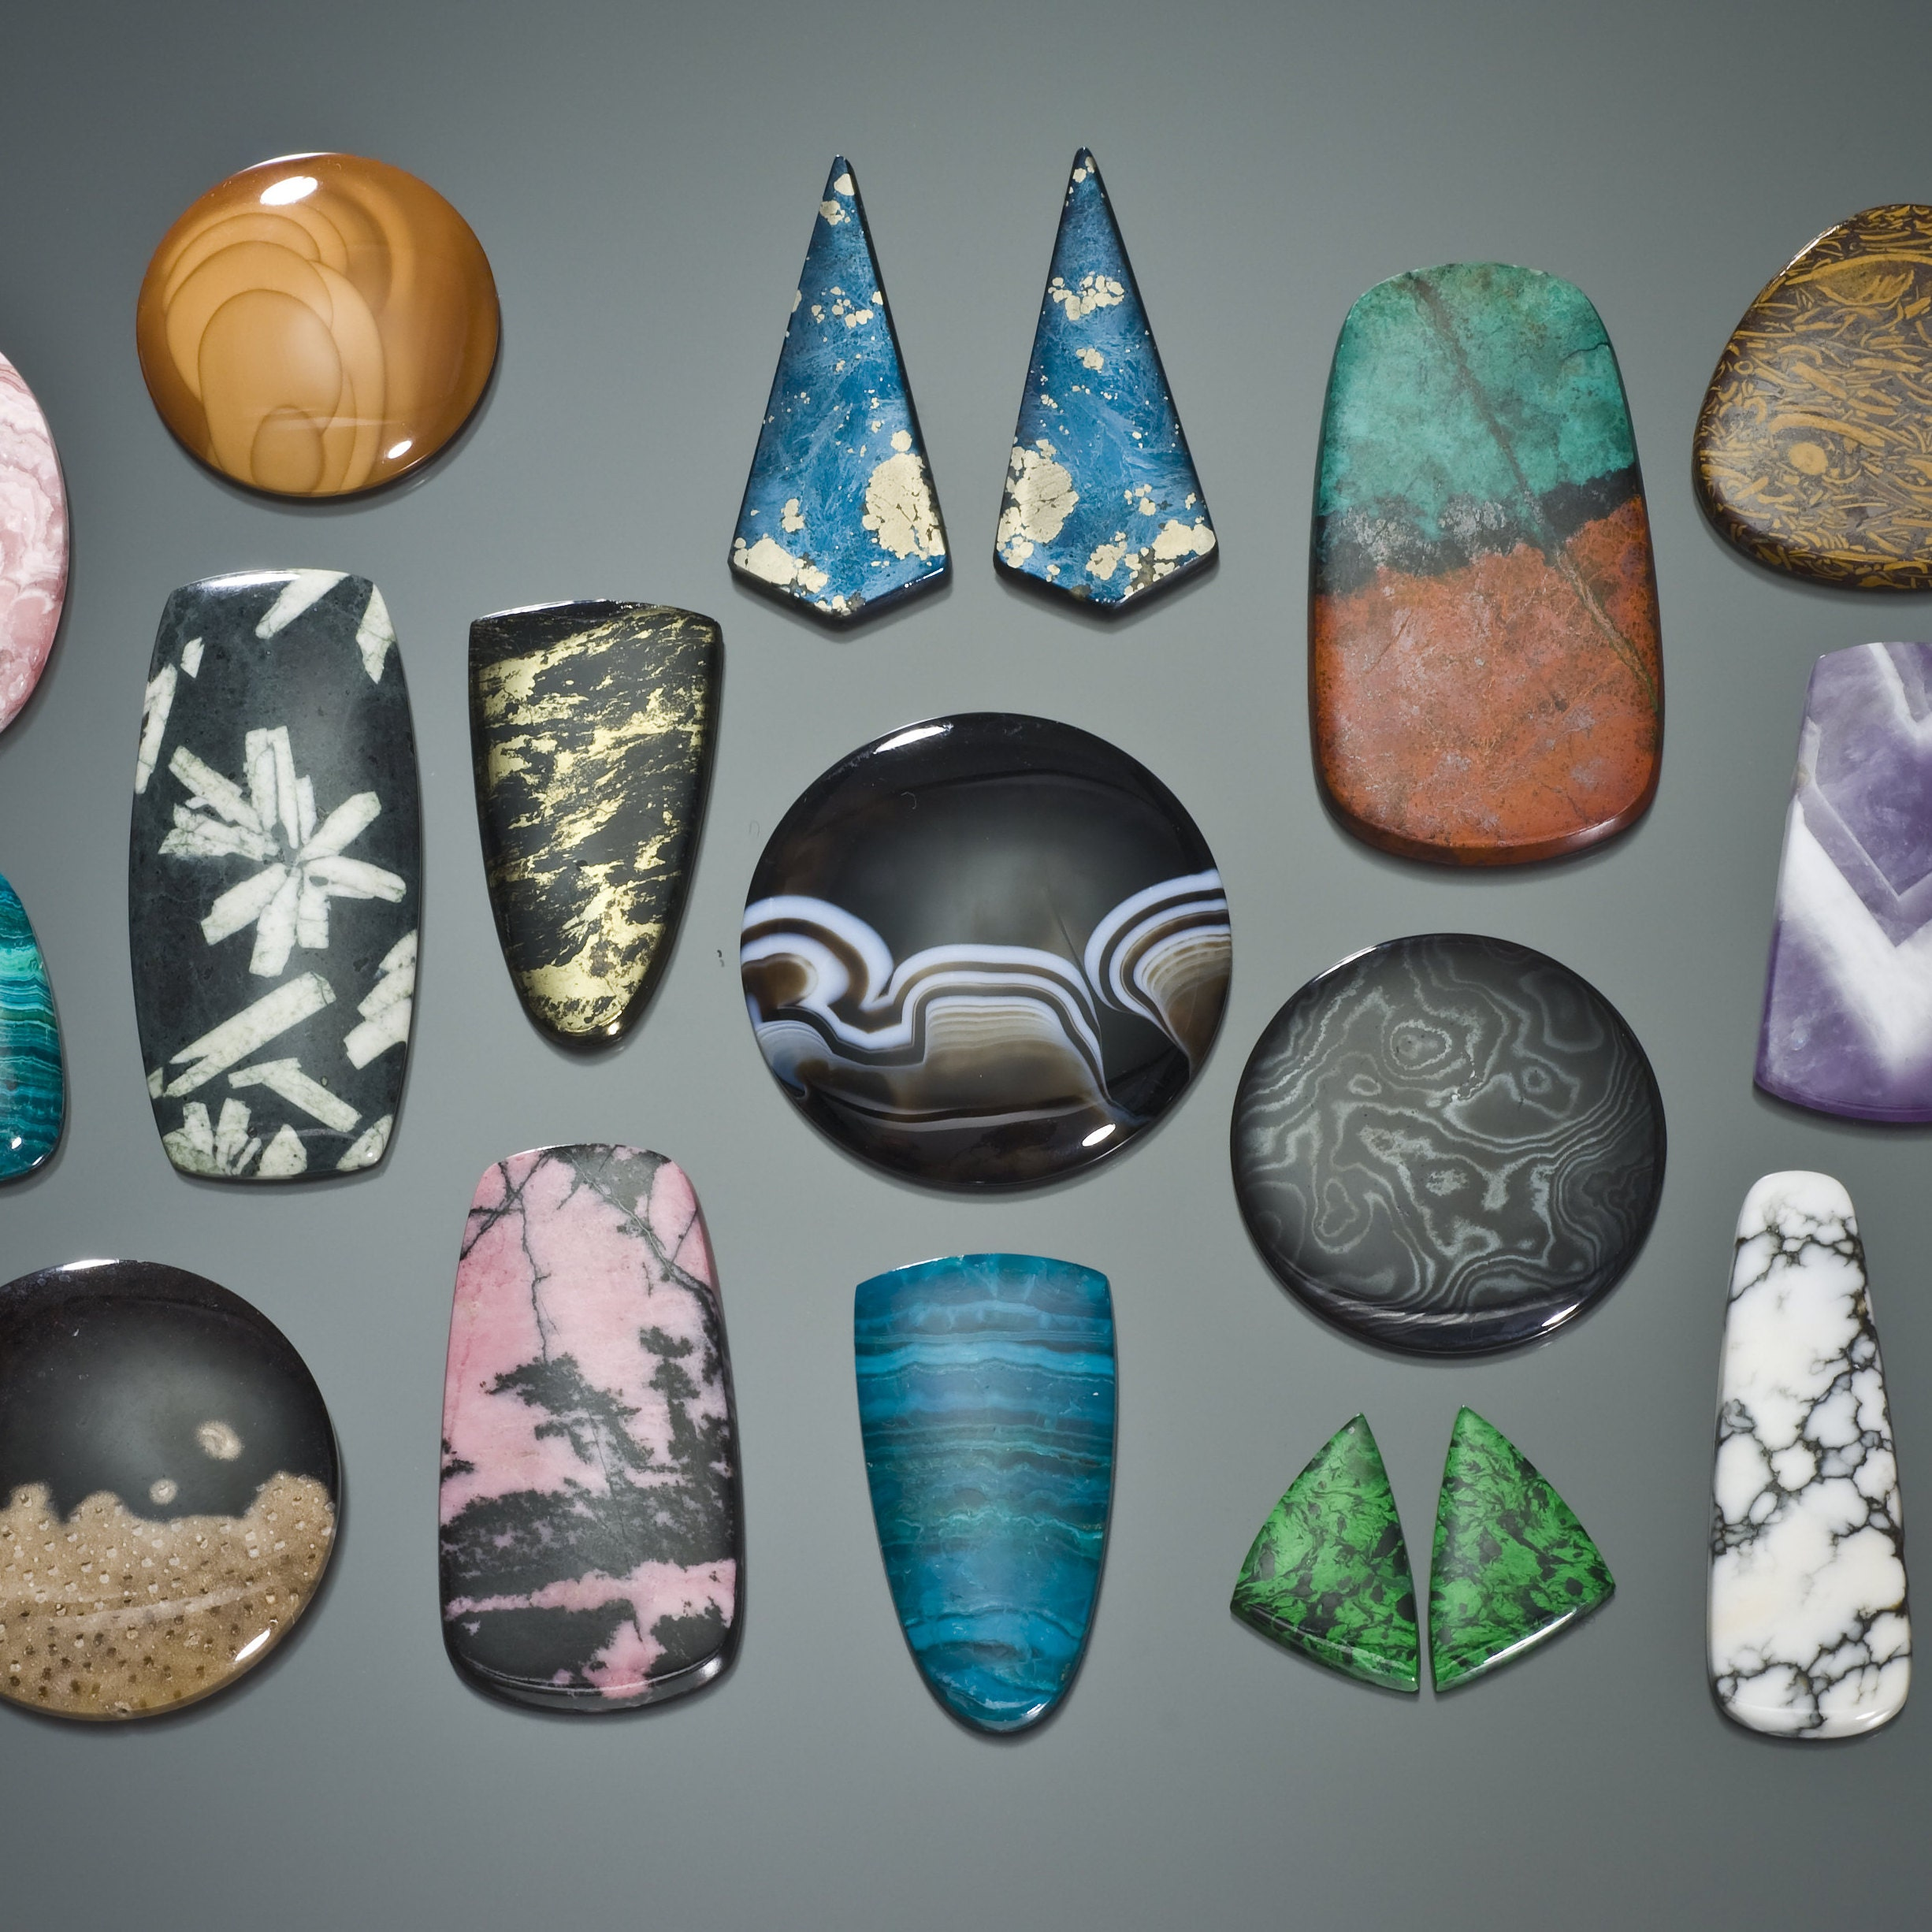 Egg Shaped Arizona Pietersite Polished Stone Semi Precious 2.4 inch #E3